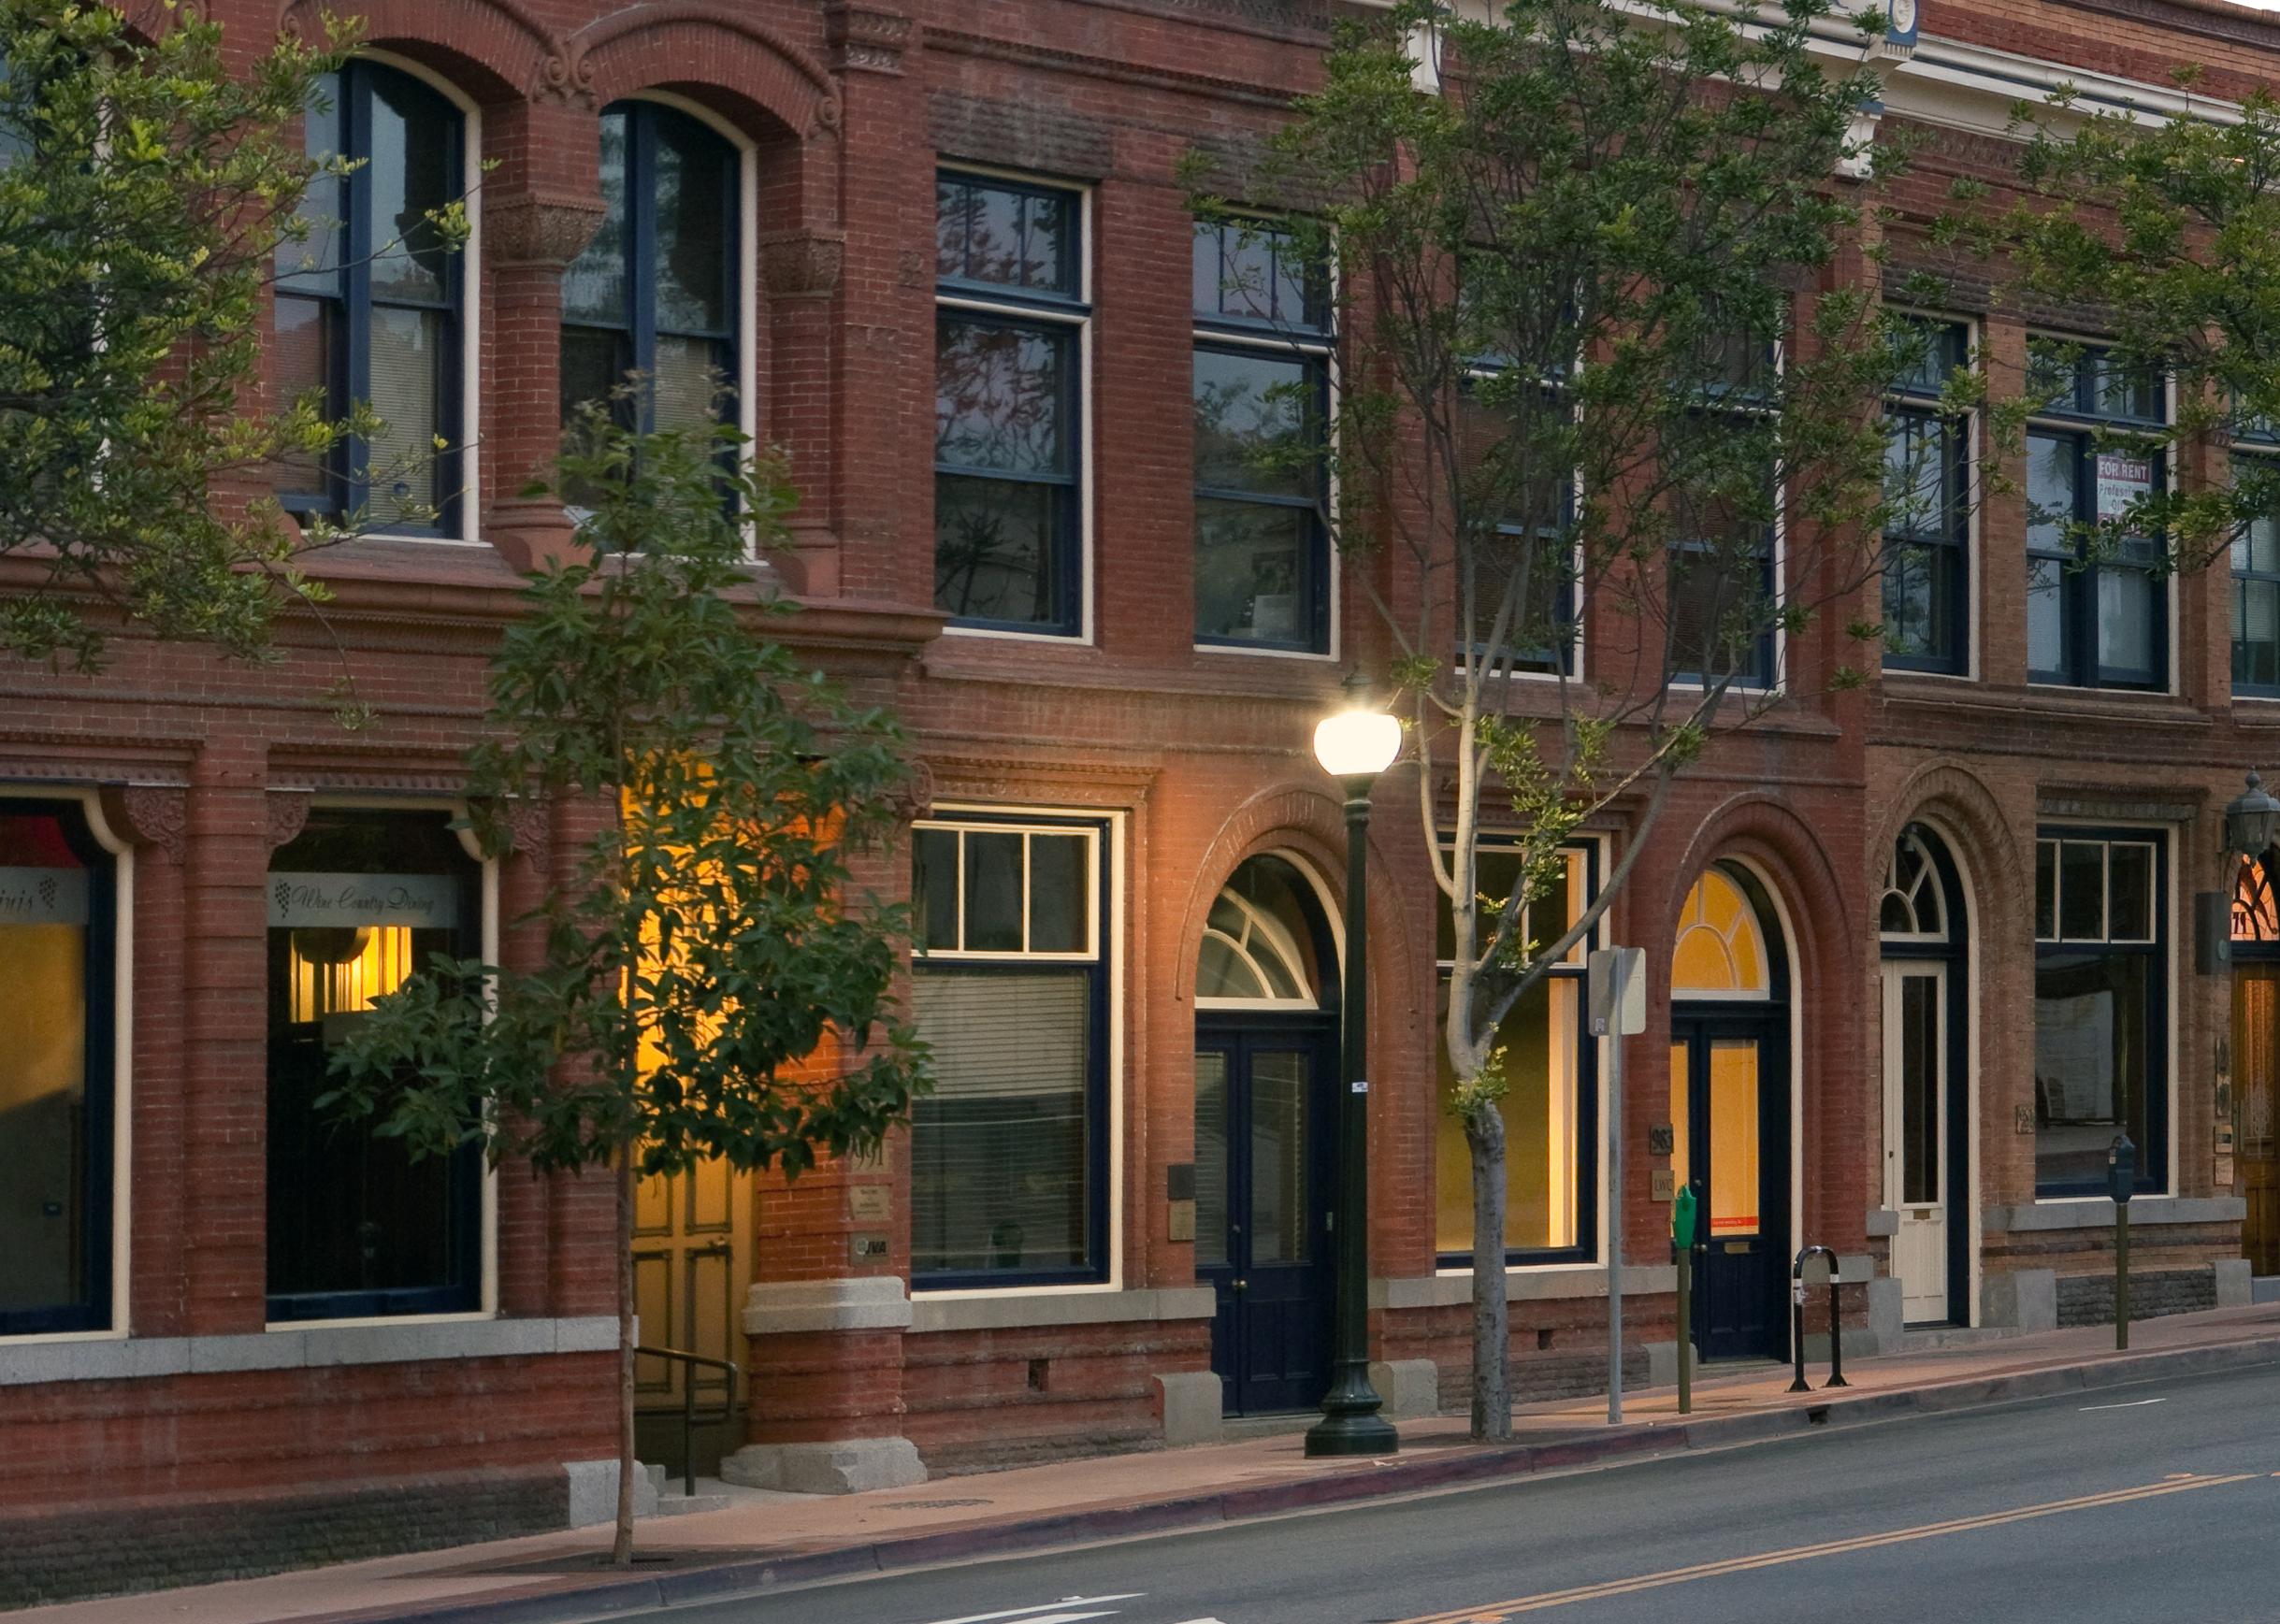 LWC Headquarters  983 Osos Street  San Luis Obispo, CA 93401  P: (805) 595-1345  F: (805) 595-1978